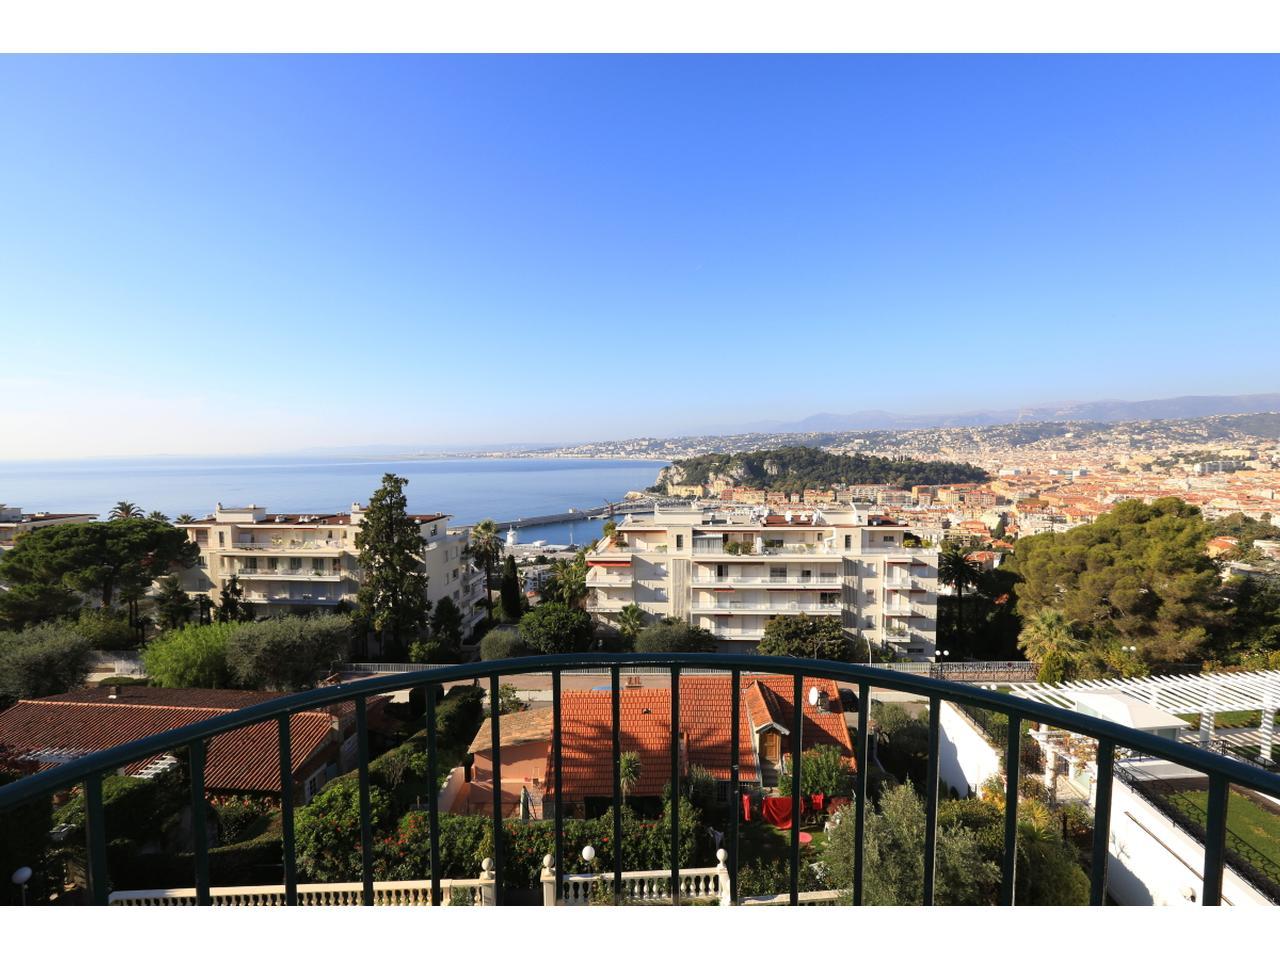 Vente Villa Parc Chambrun Nice